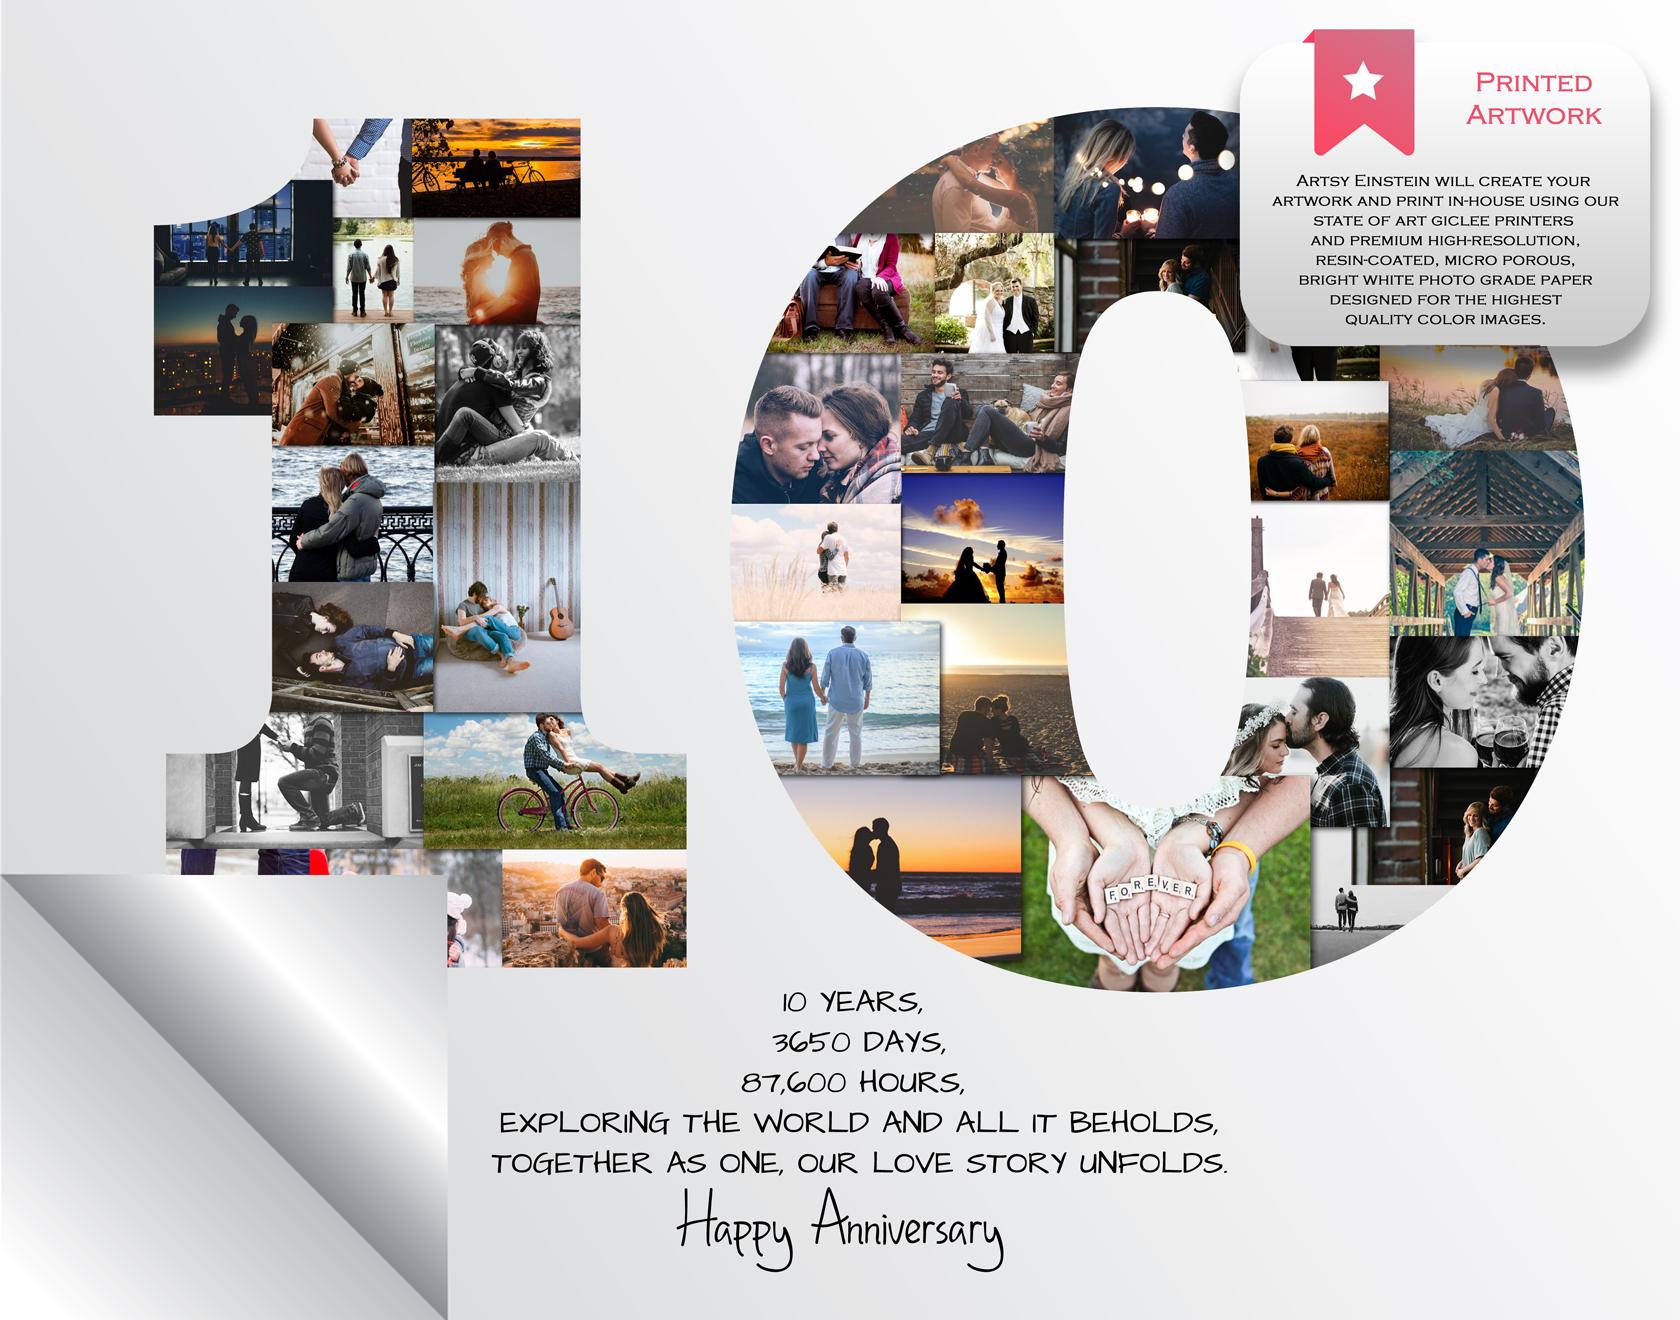 10th anniversary photo collage 10th birthday collage milestone anniversary collage